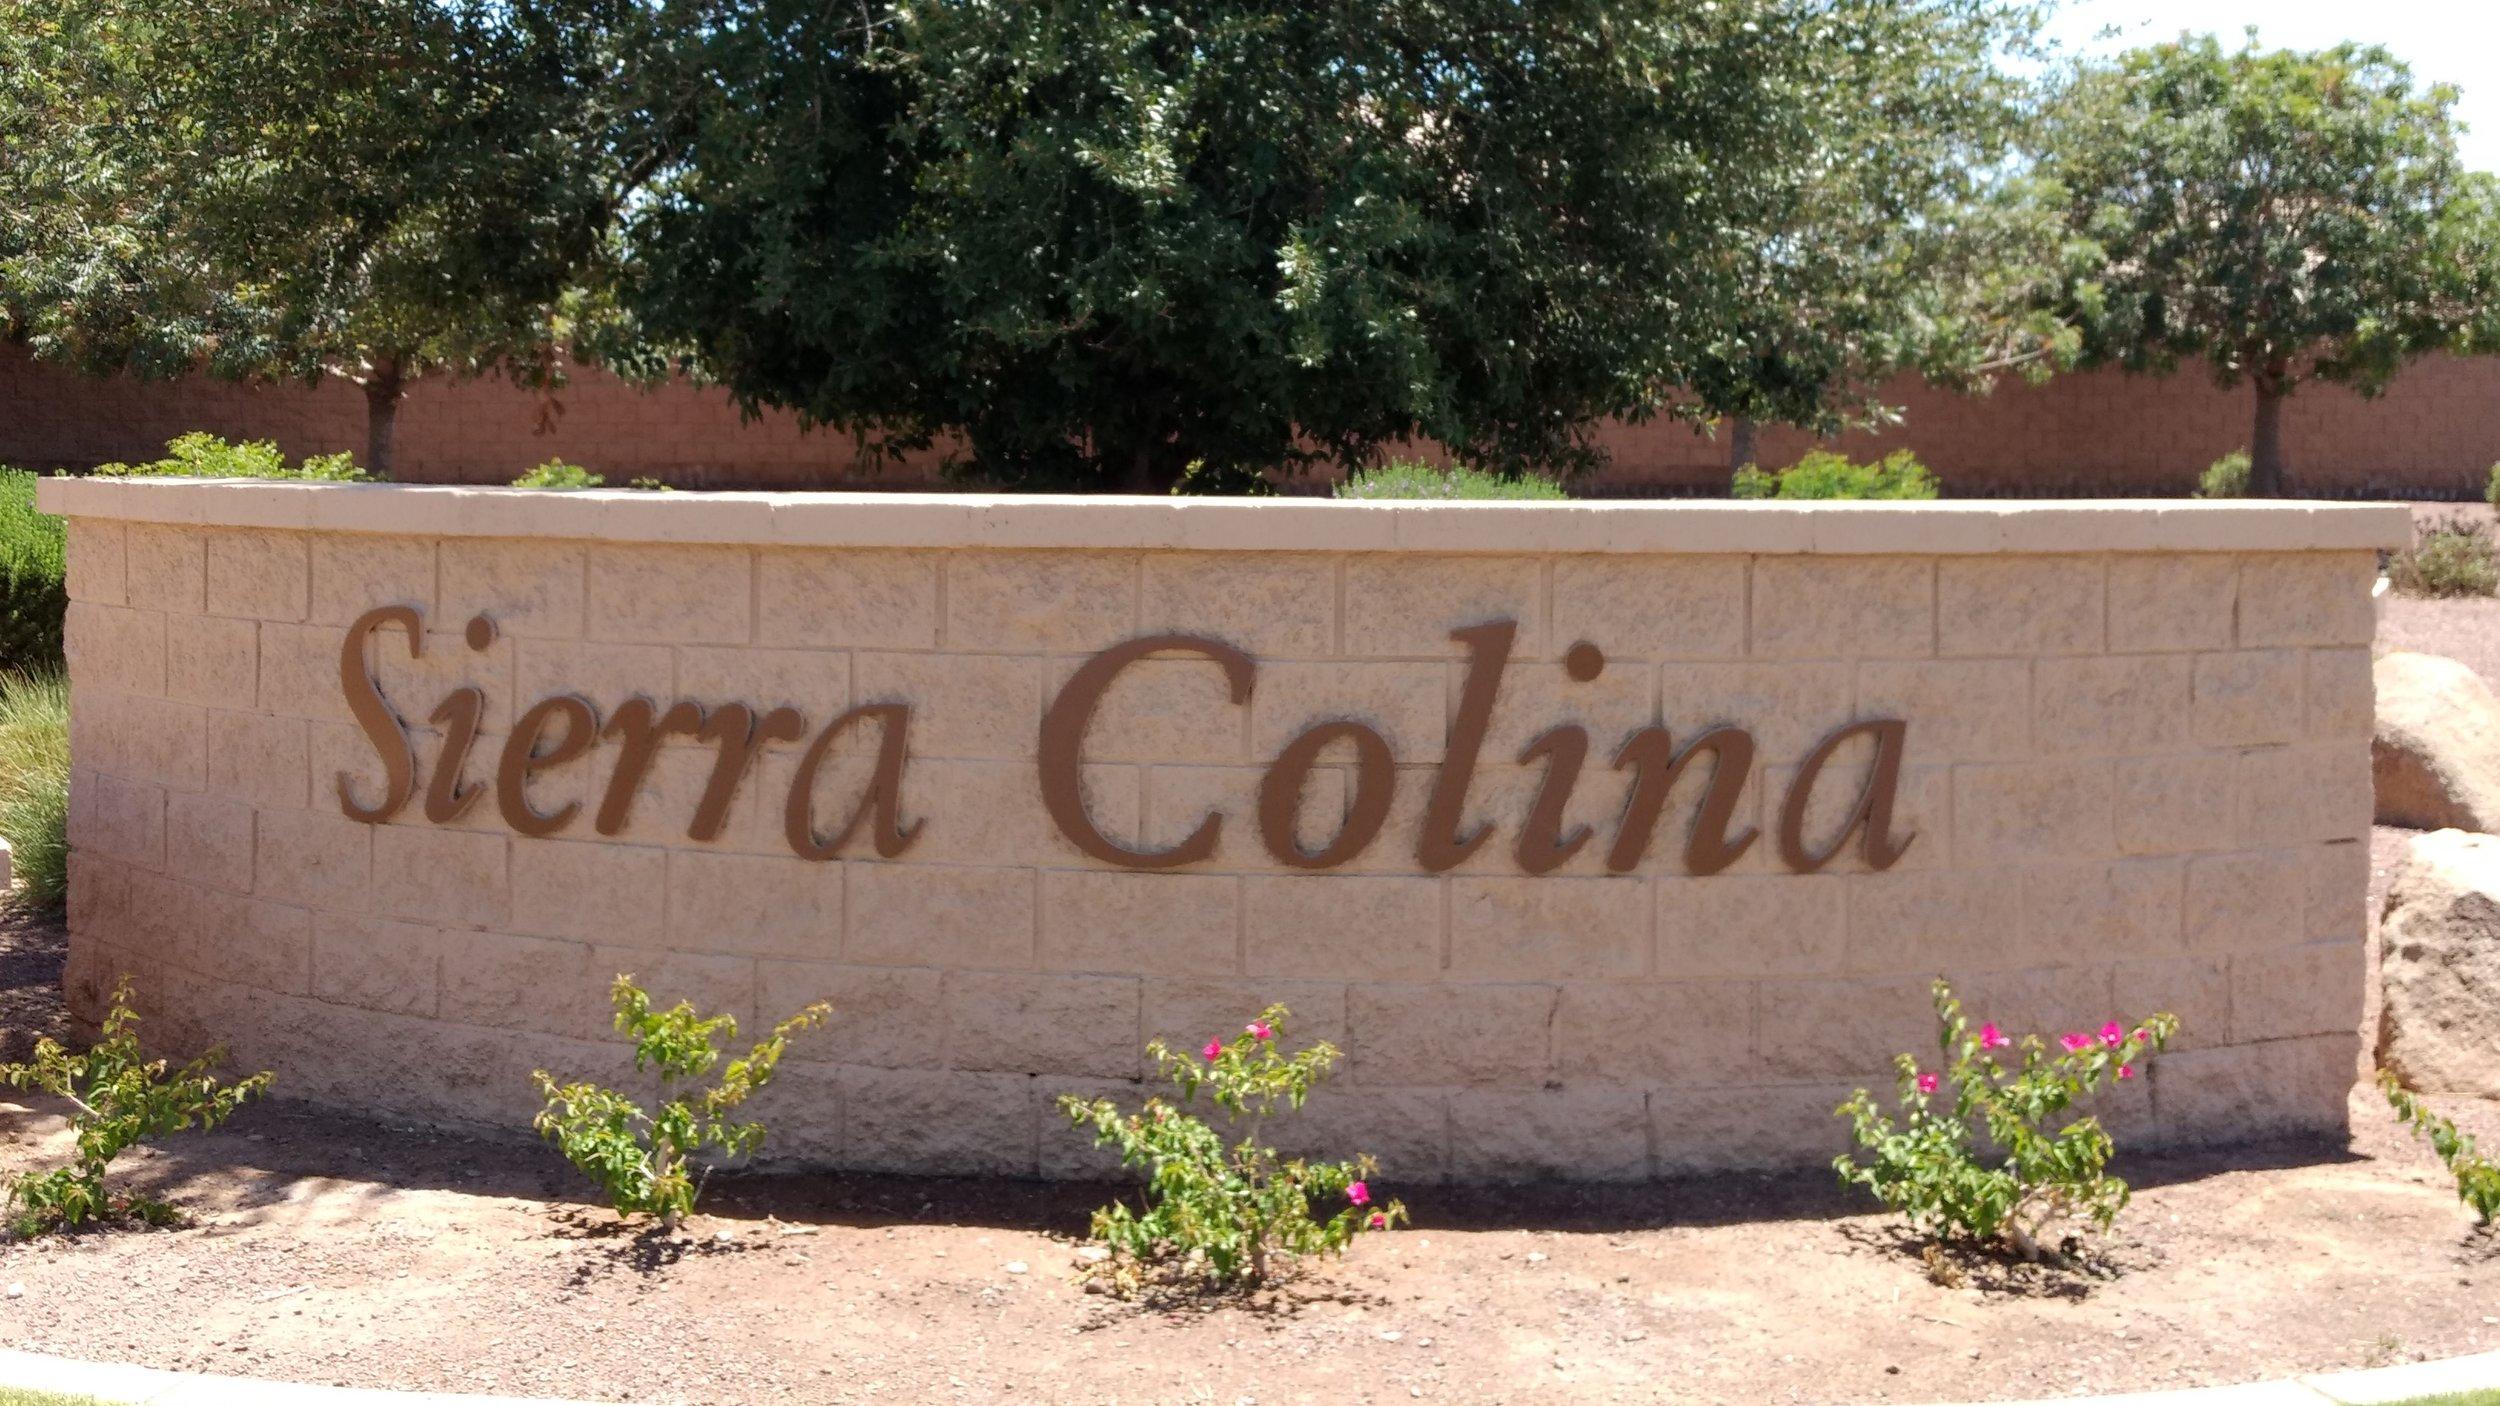 Sierra_Colina.jpg